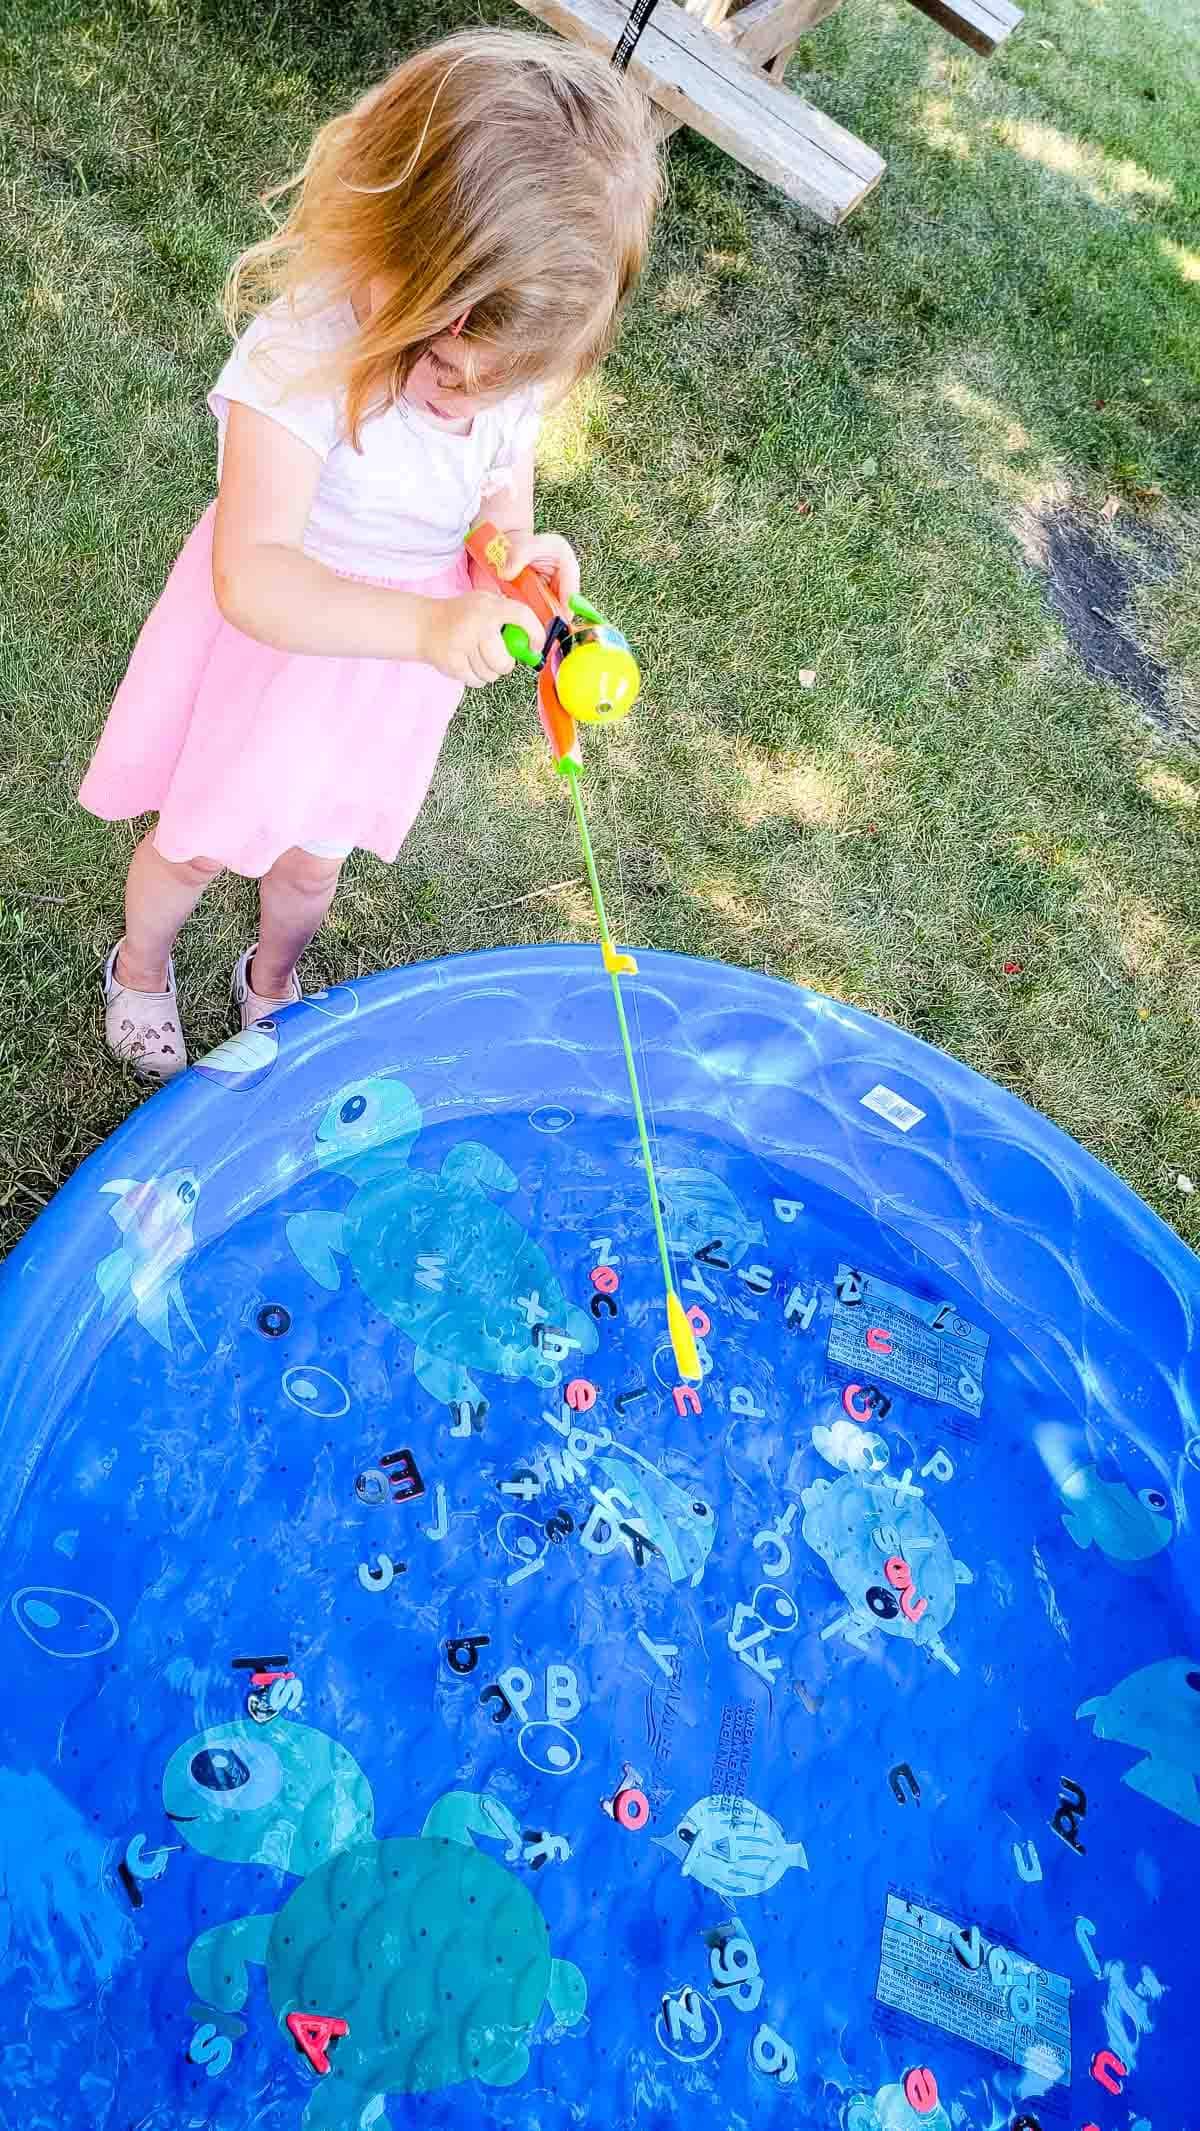 Little girl fishing for letters in kiddie pool